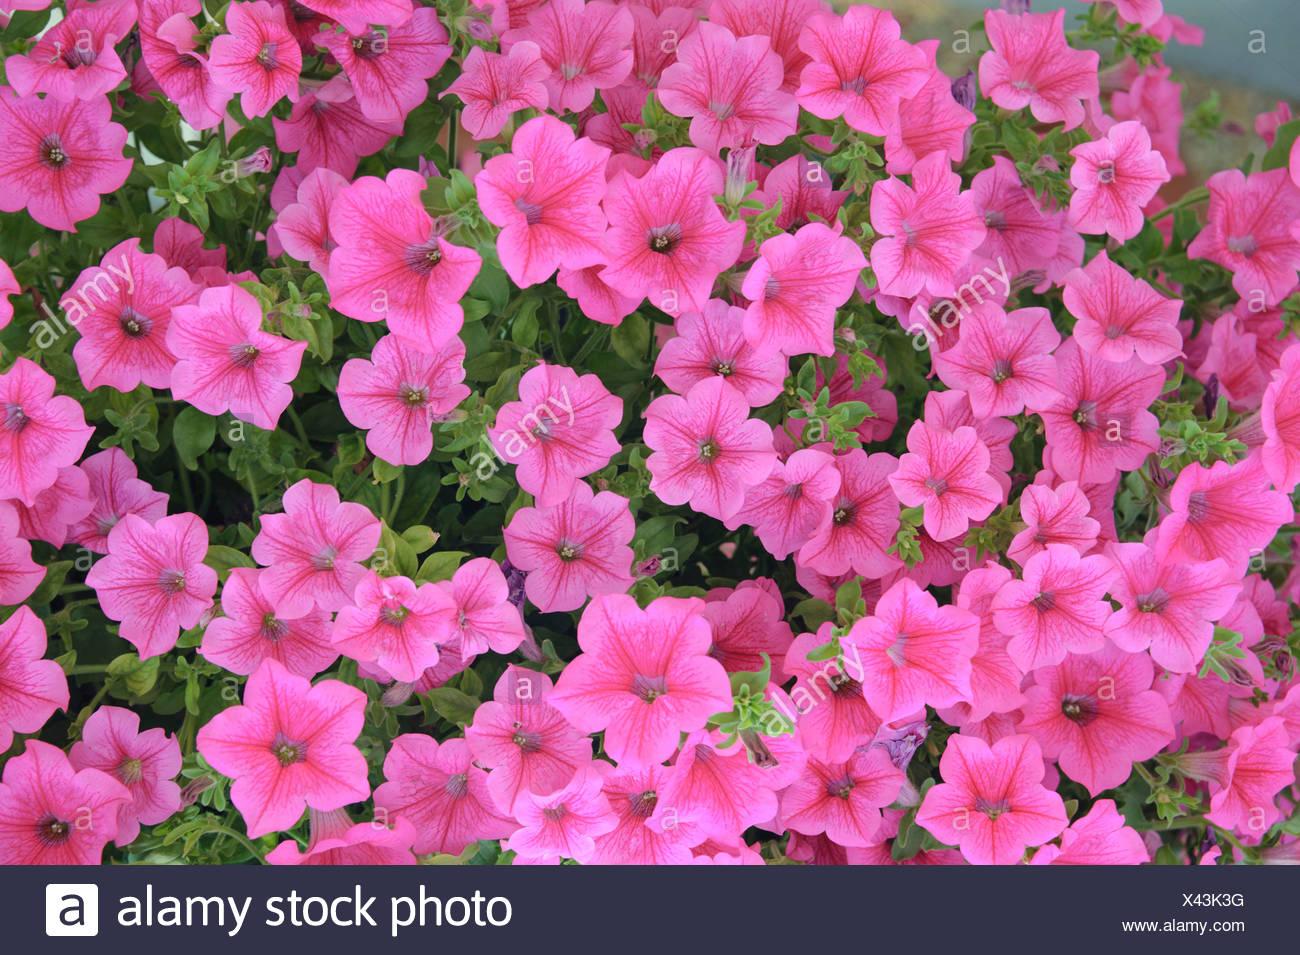 Jardín petunia (Petunia 'Hot Pink', Petunia Hot Pink), cultivar Hot Pink, floreciendo Imagen De Stock